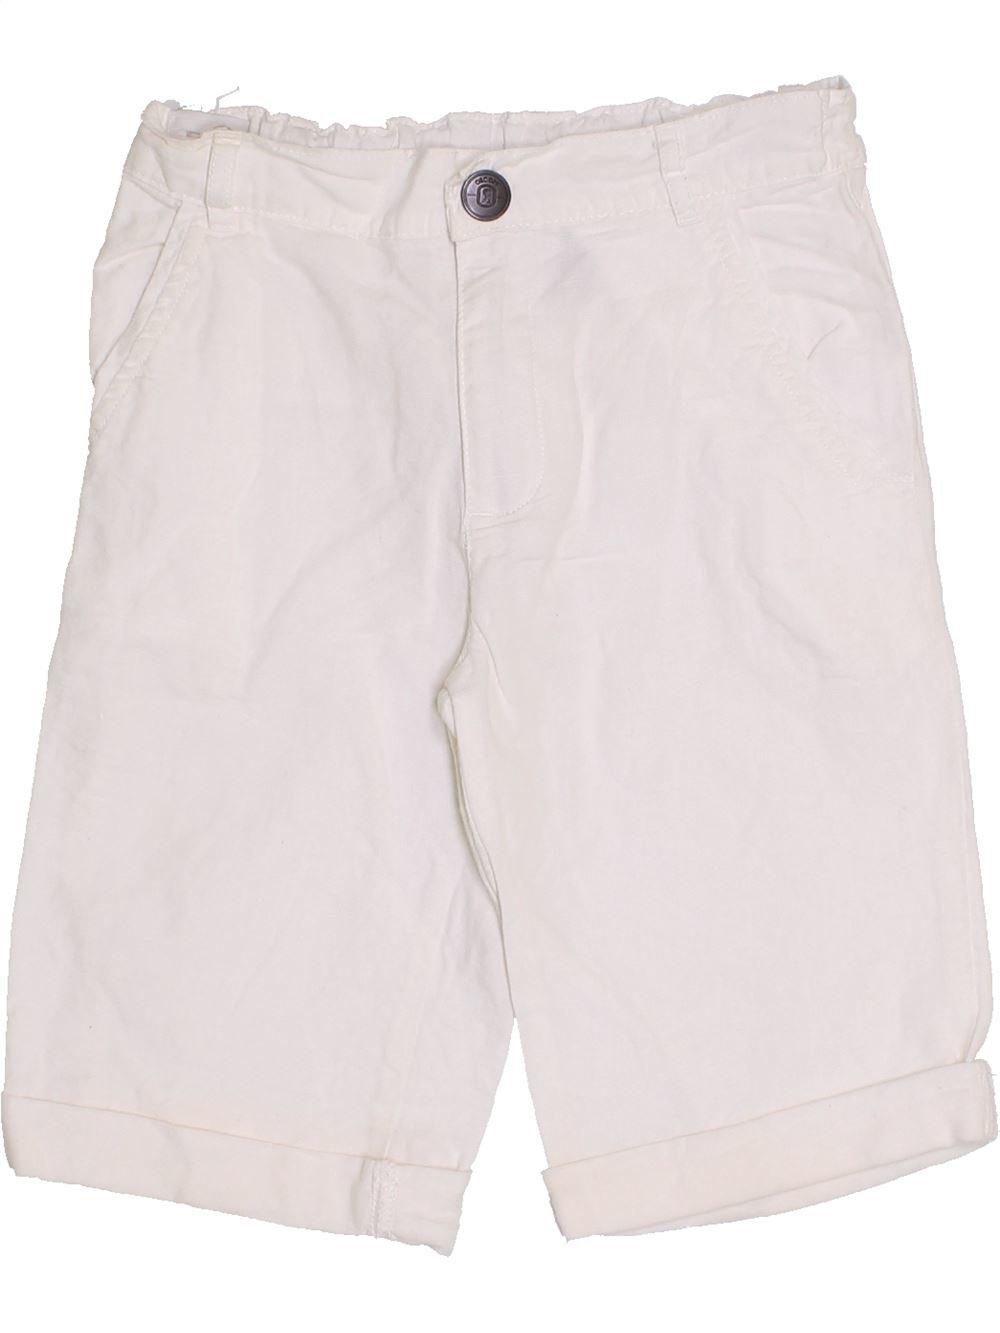 23b90f7e2e51 Short - Bermuda blanc ORCHESTRA du 8 ans pour Garcon - 1352670